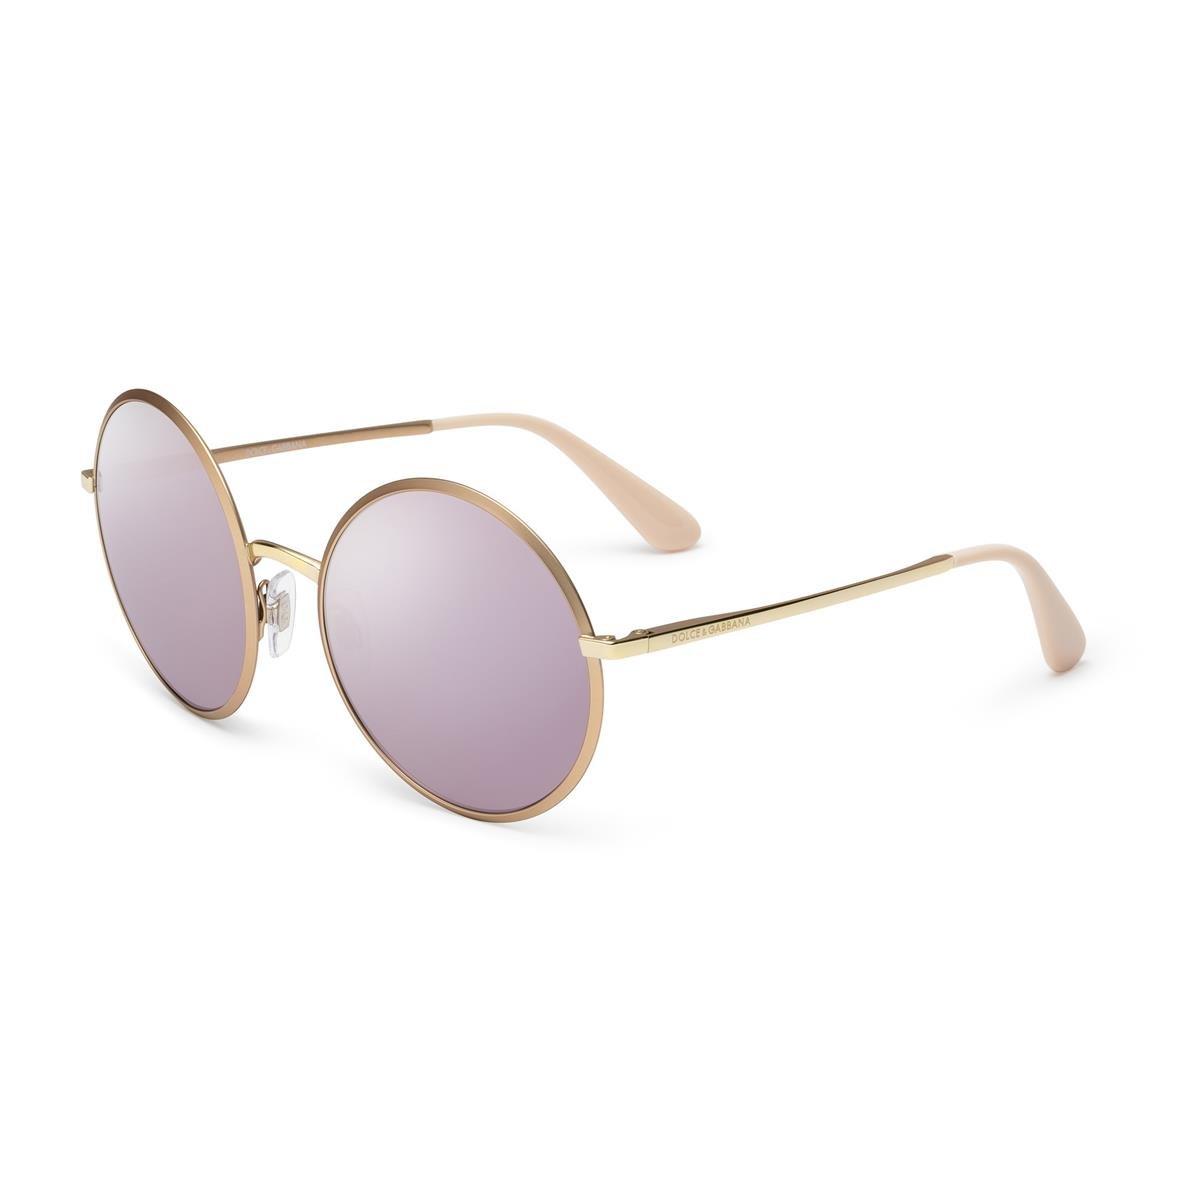 TALLA 56. Dolce & Gabbana Sonnenbrille (DG2155)